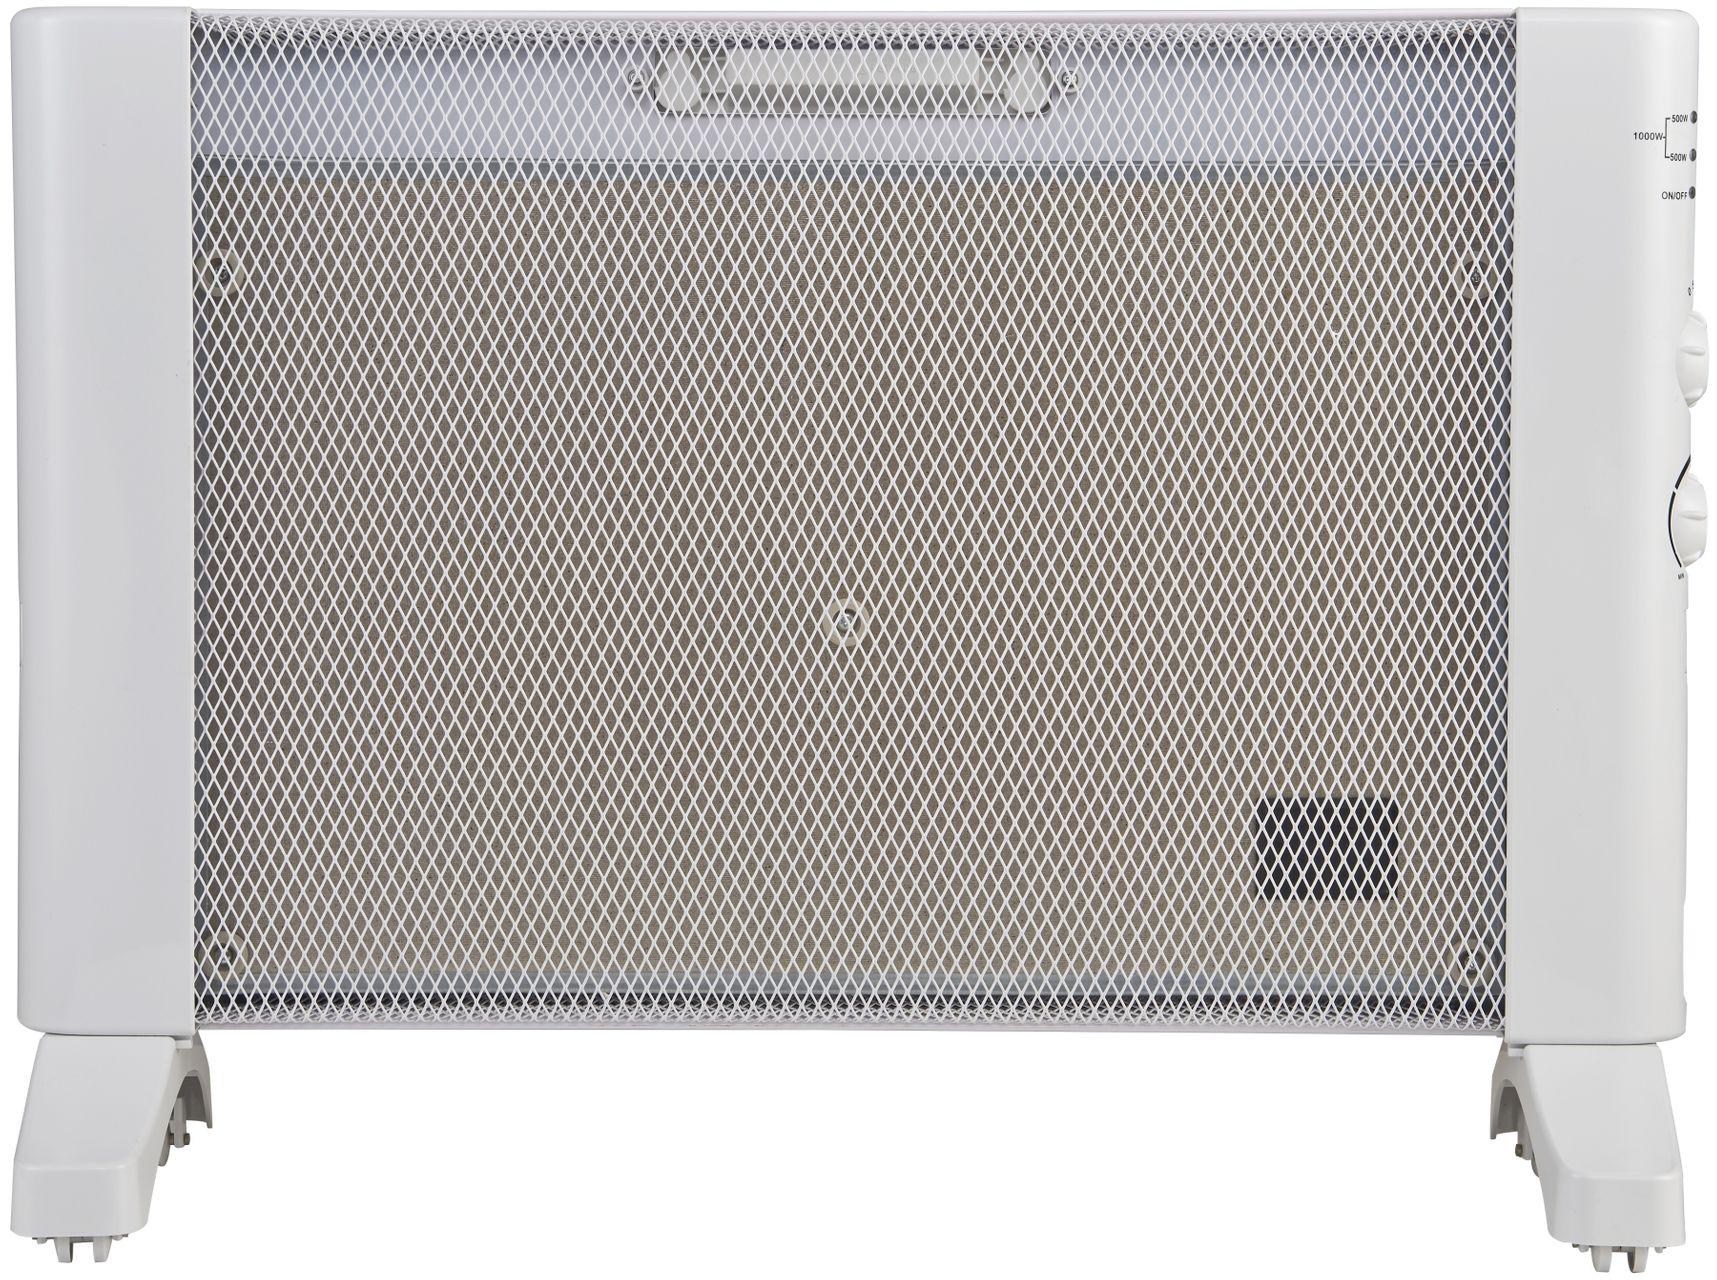 EL FUEGO AY 699 Wärmewellenheizung, 1000 W